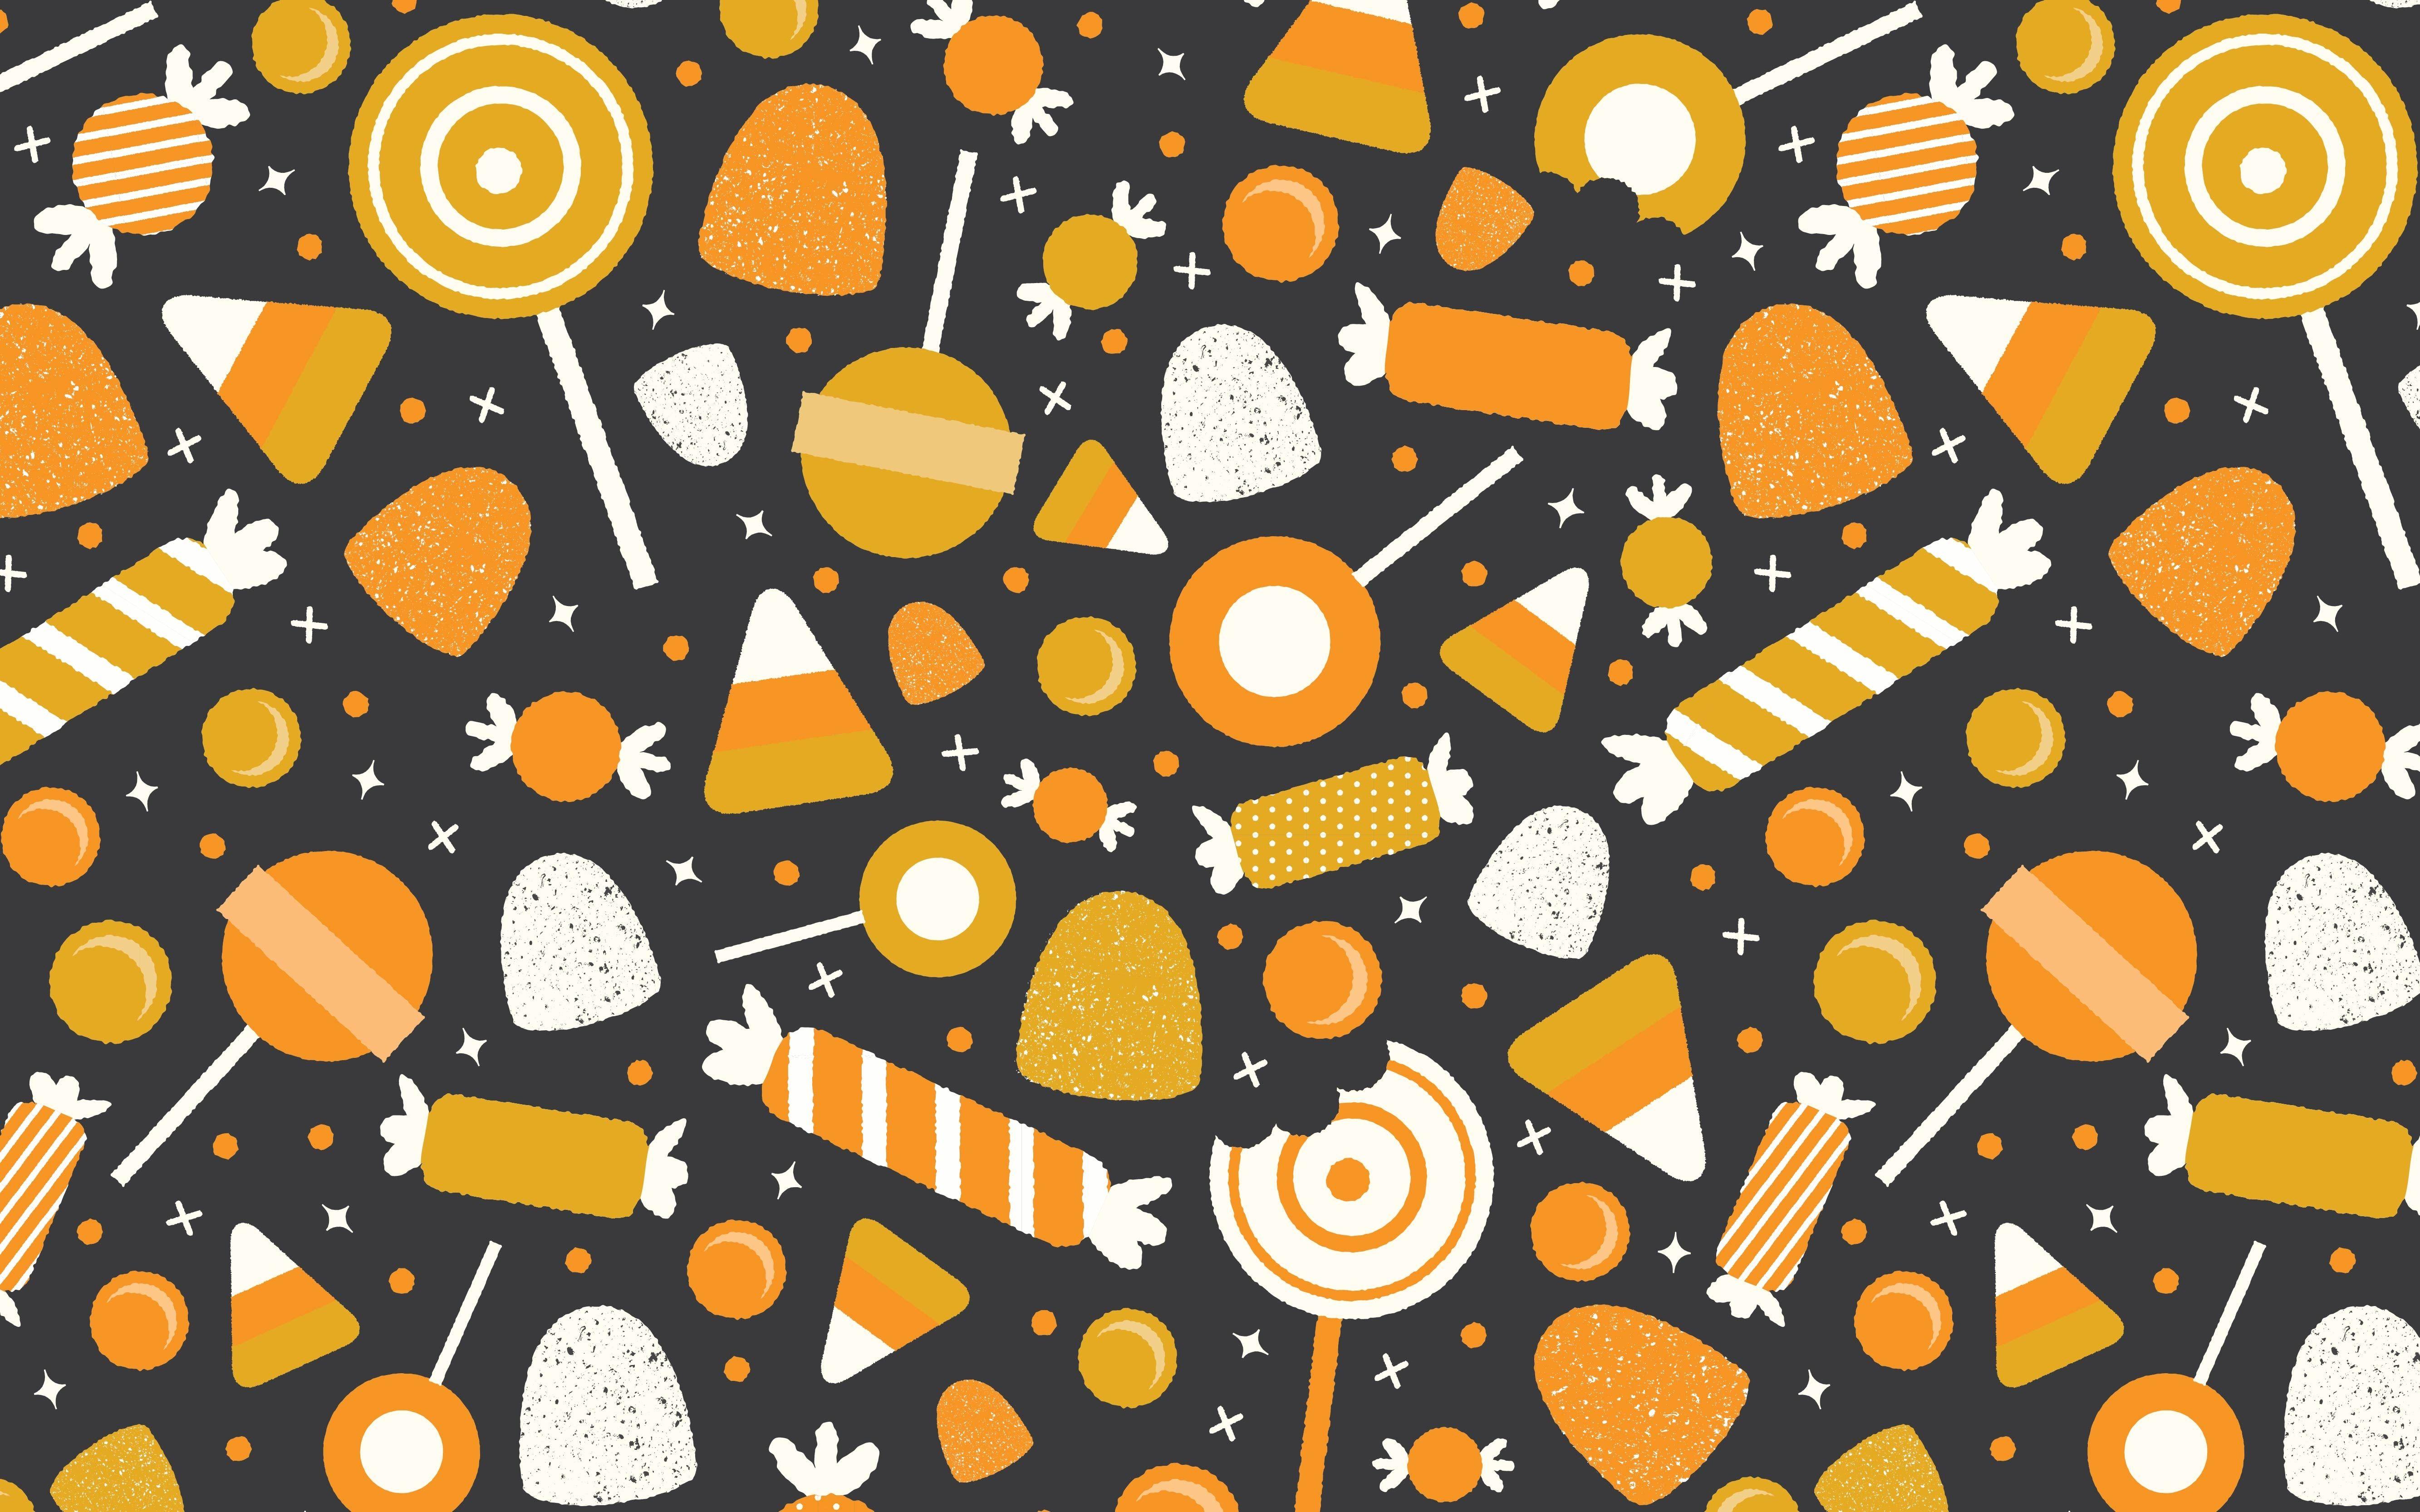 Cute Halloween Desktop Wallpapers   Top Cute Halloween 5333x3333